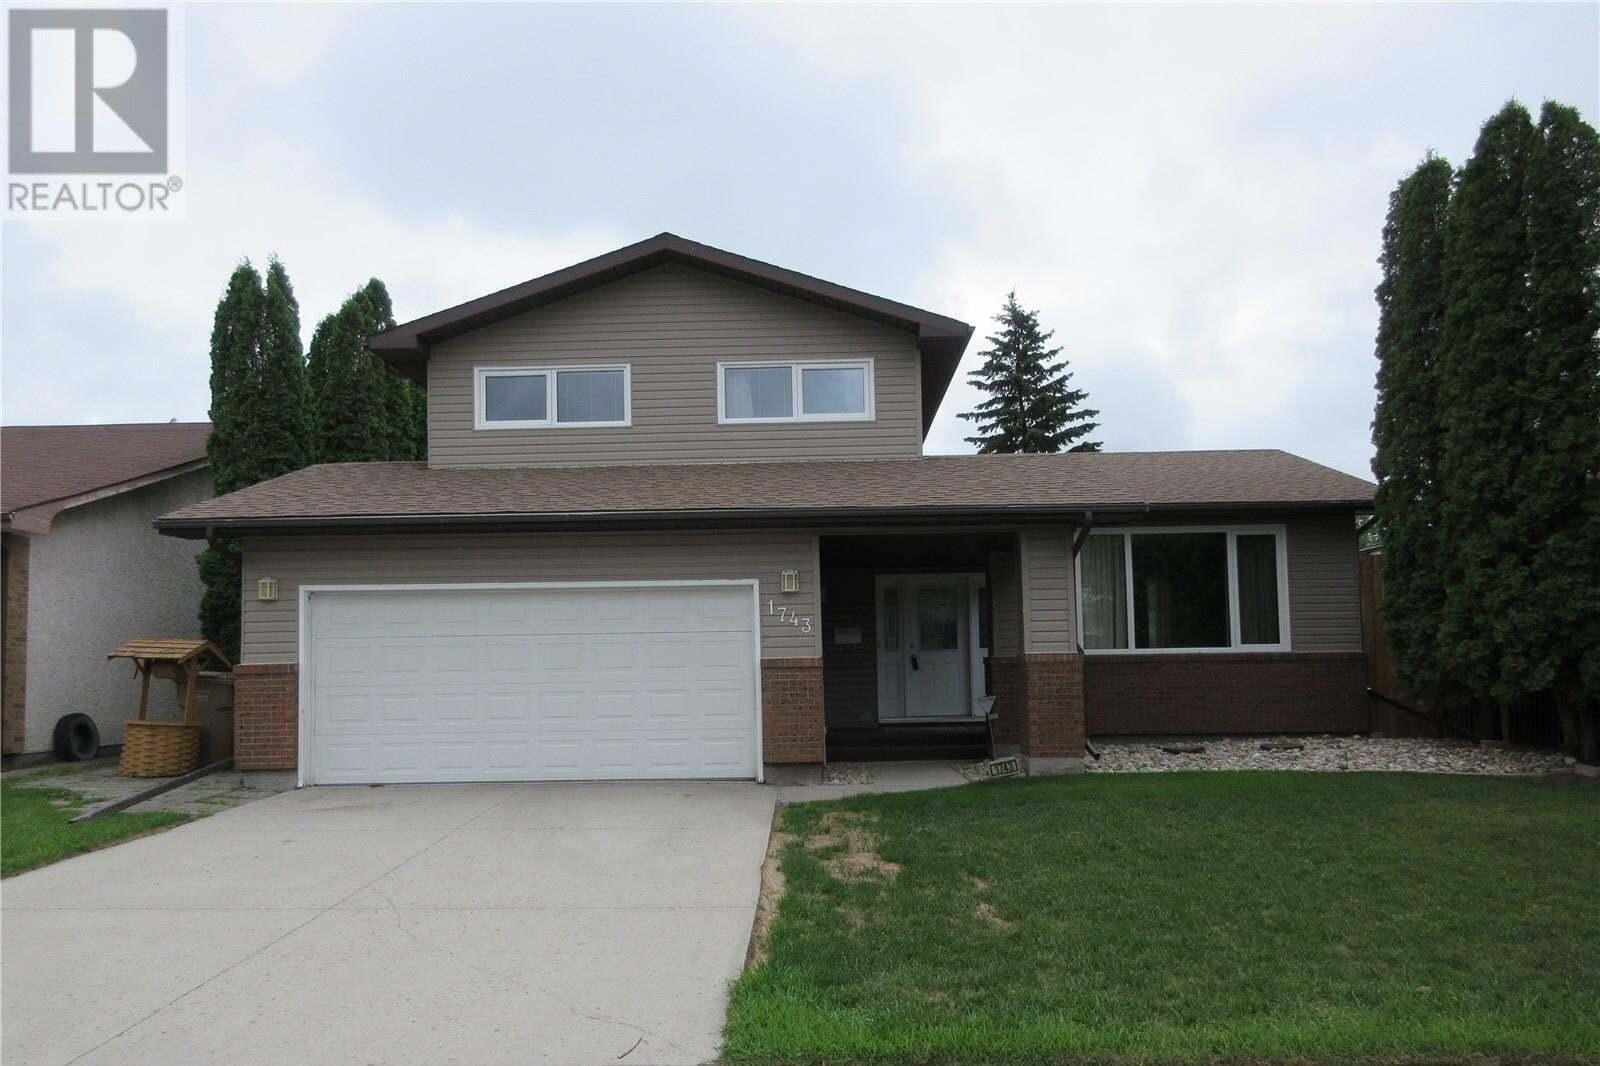 House for sale at 1743 Blair By E Regina Saskatchewan - MLS: SK816824